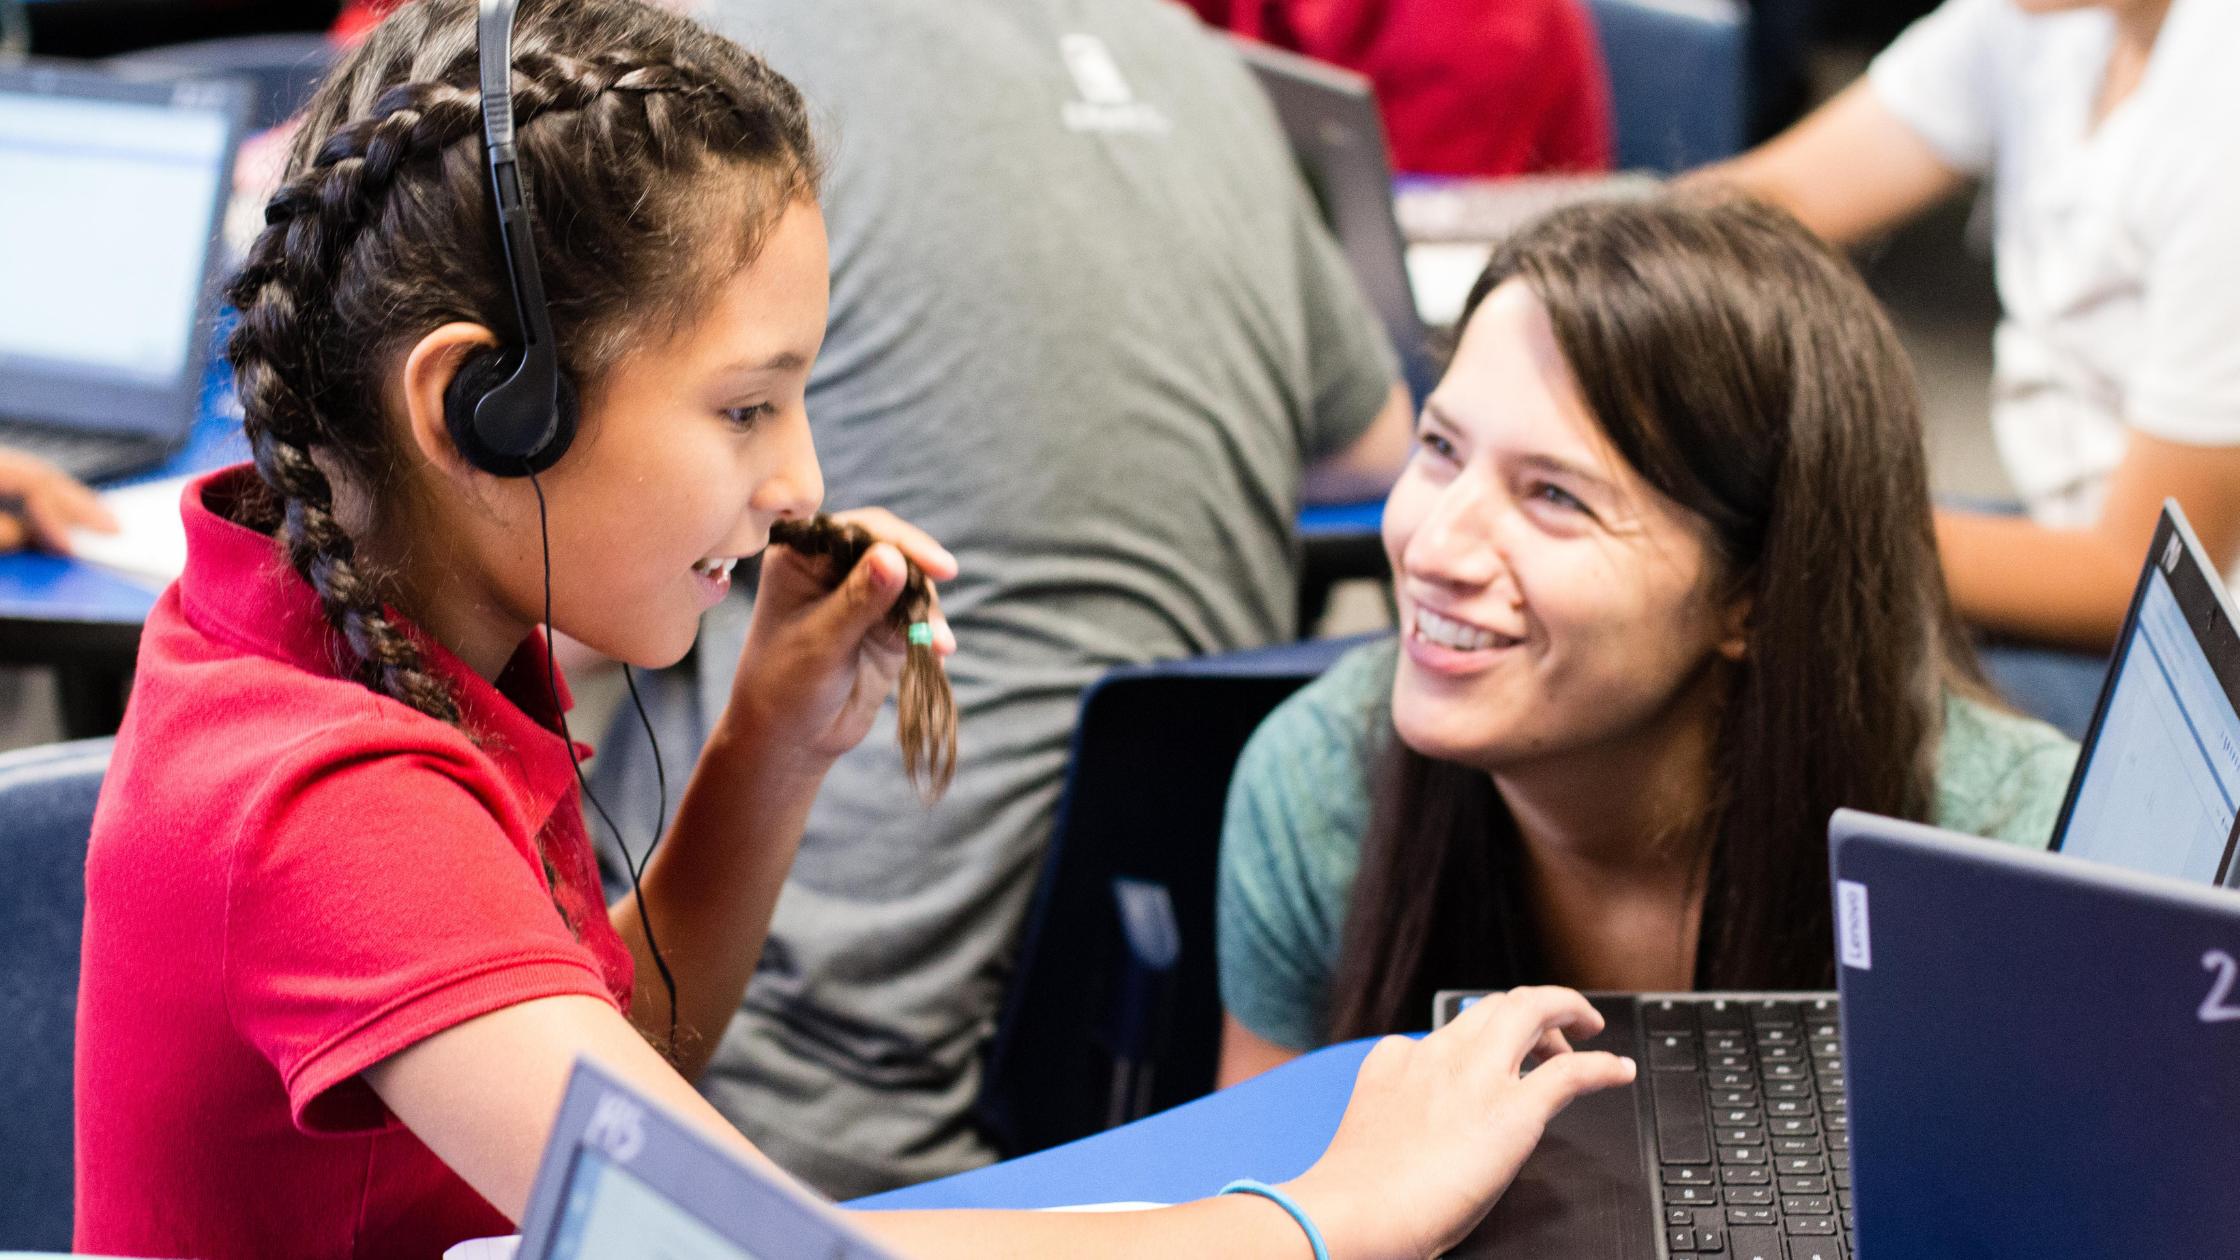 Mentoring is the 'Secret Sauce' for Aspen Valley Prep Closing the Achievement Gap